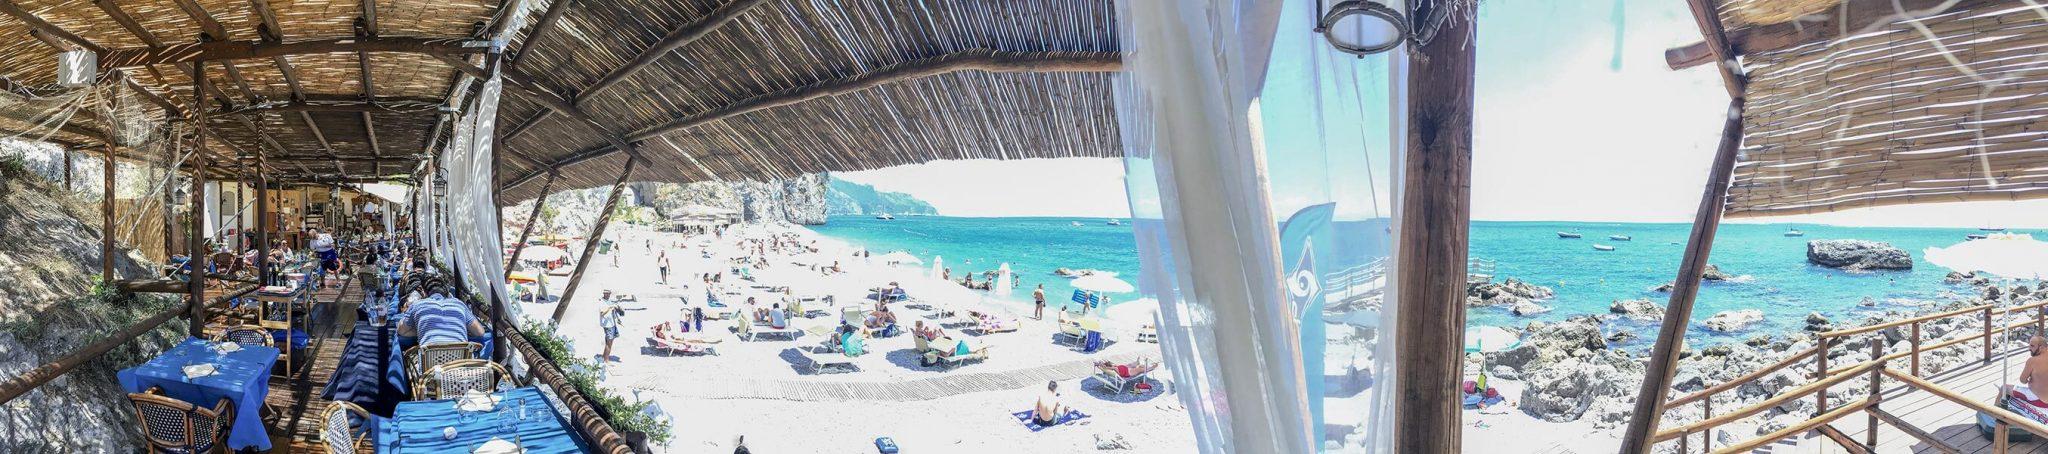 "Panorama vom Restaurant und Strand ""Lido degli artisti"" © Claudia Mattheis"